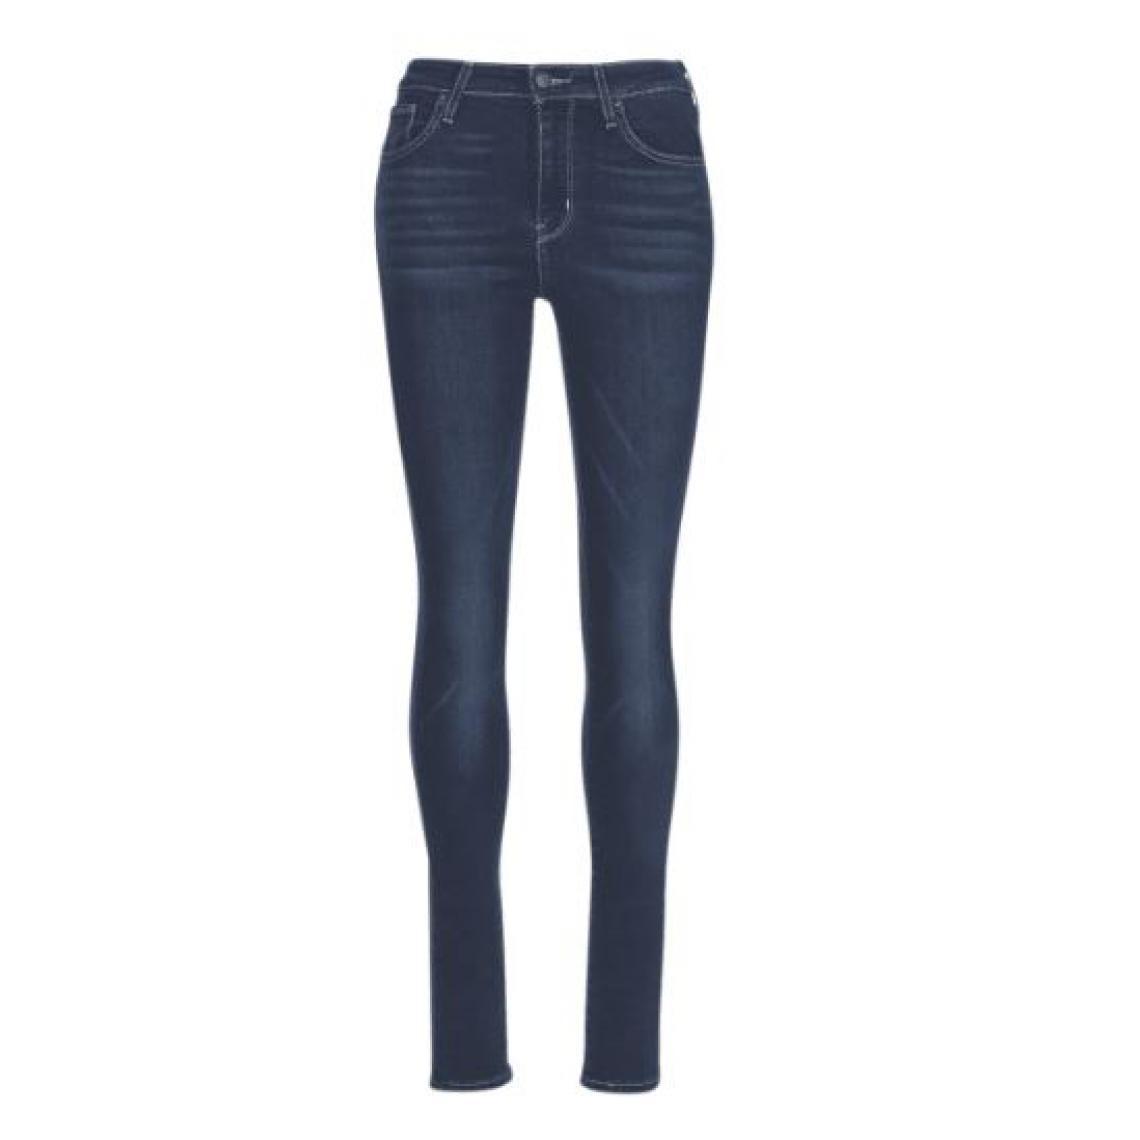 jean skinny taille haute levi 39 s femme bleu 3 suisses. Black Bedroom Furniture Sets. Home Design Ideas